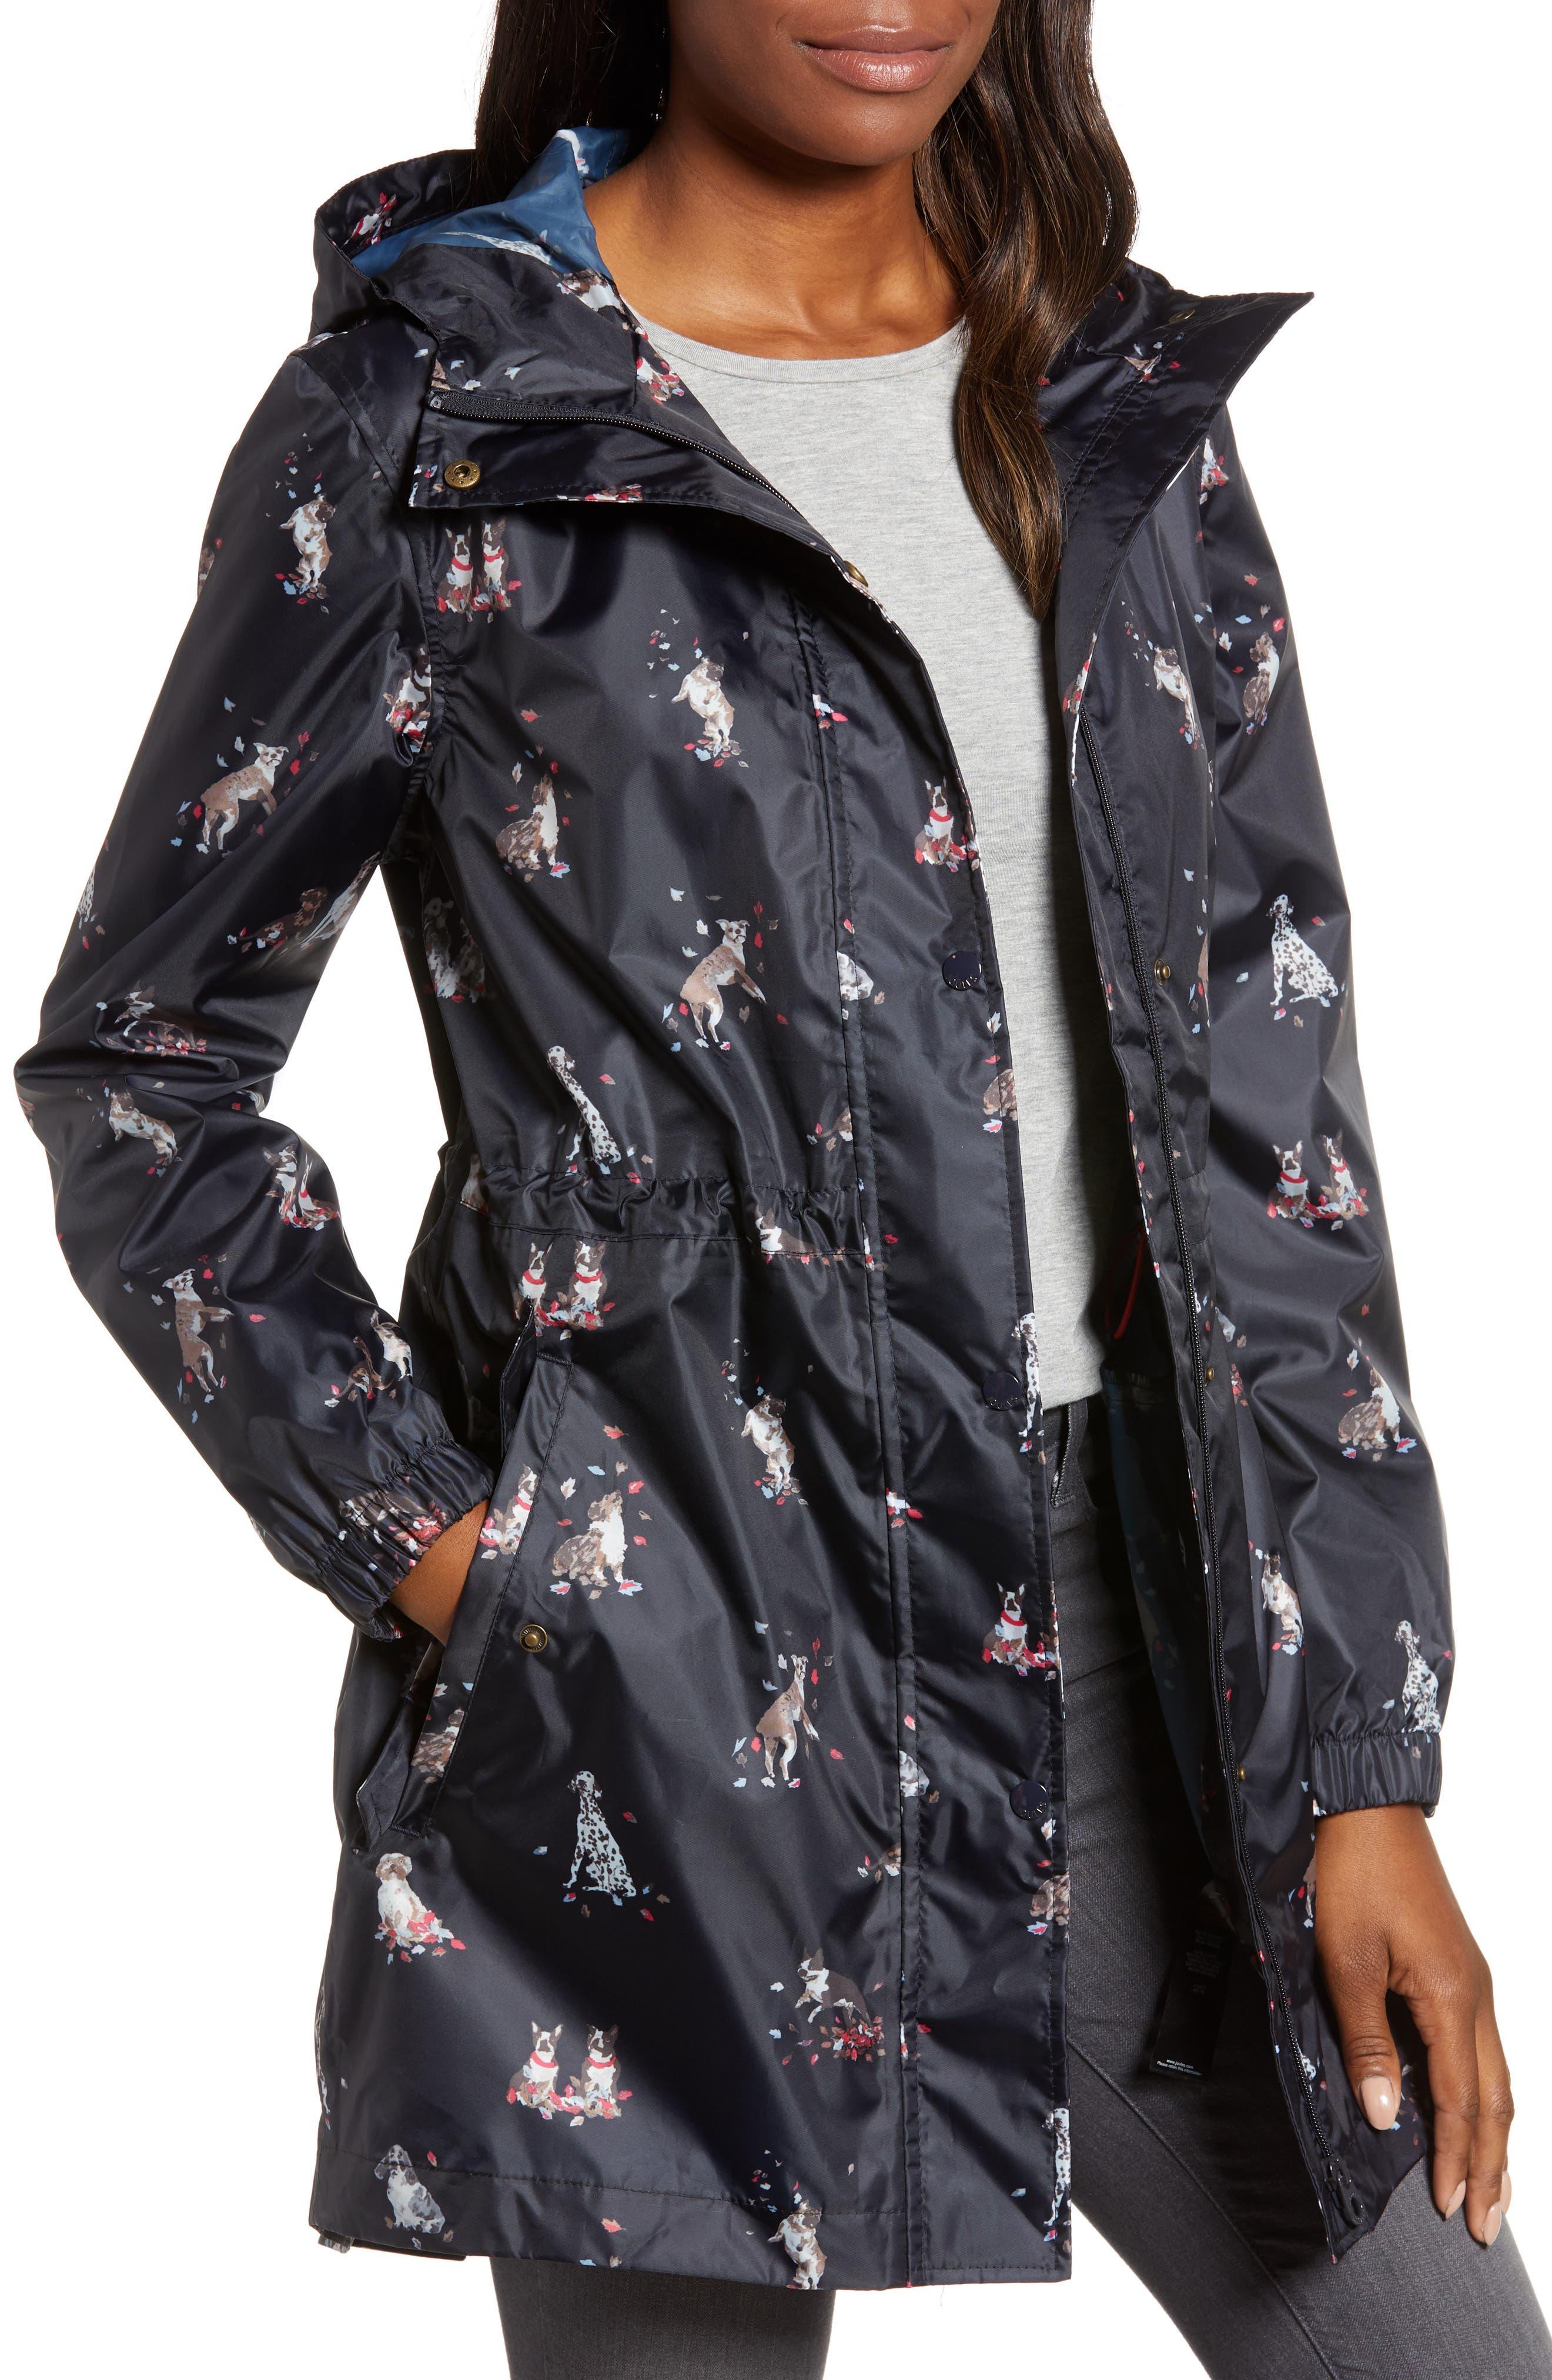 Right as Rain Packable Print Hooded Raincoat, Main, color, 410